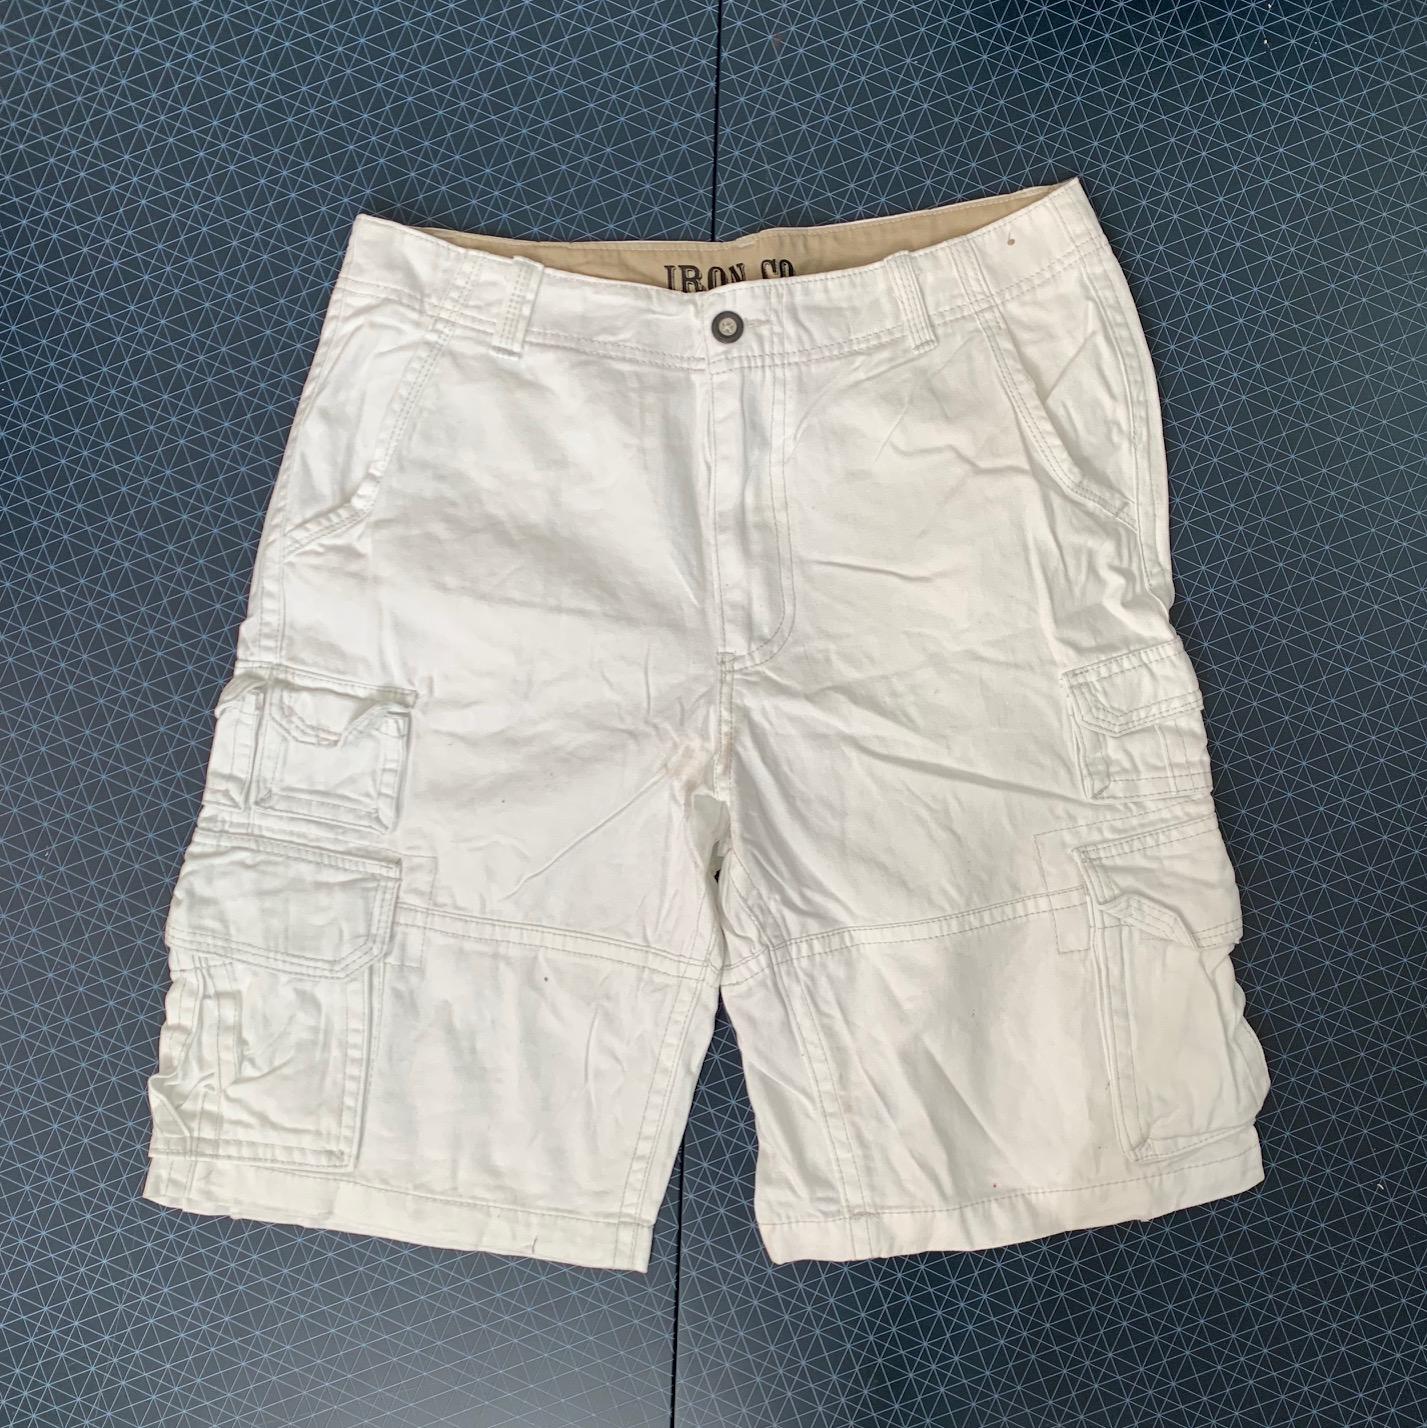 Белые мужские шорты от IRON CO